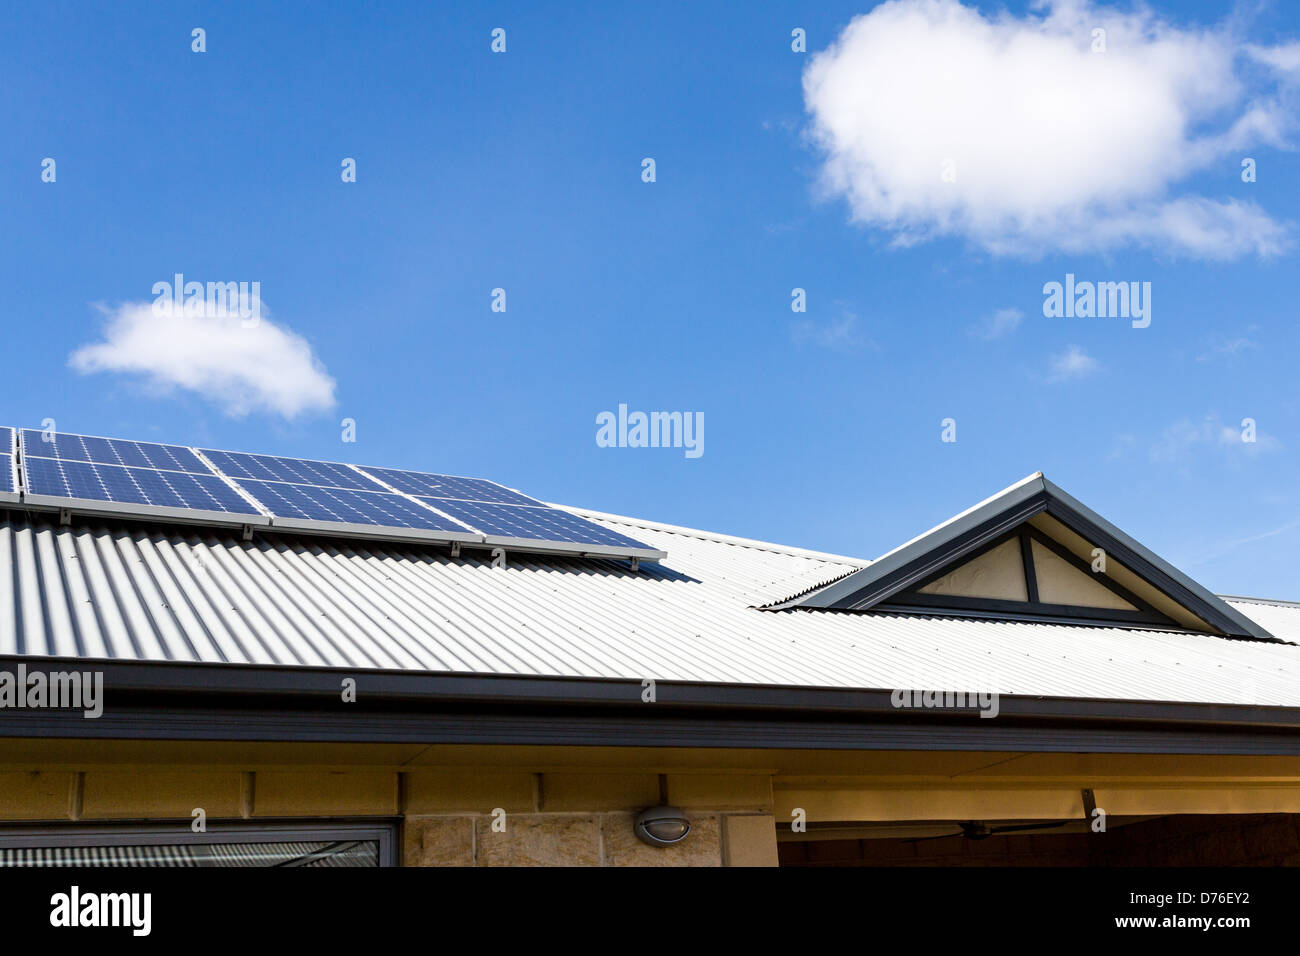 Gable en acero Colorbond techo con paneles solares Imagen De Stock